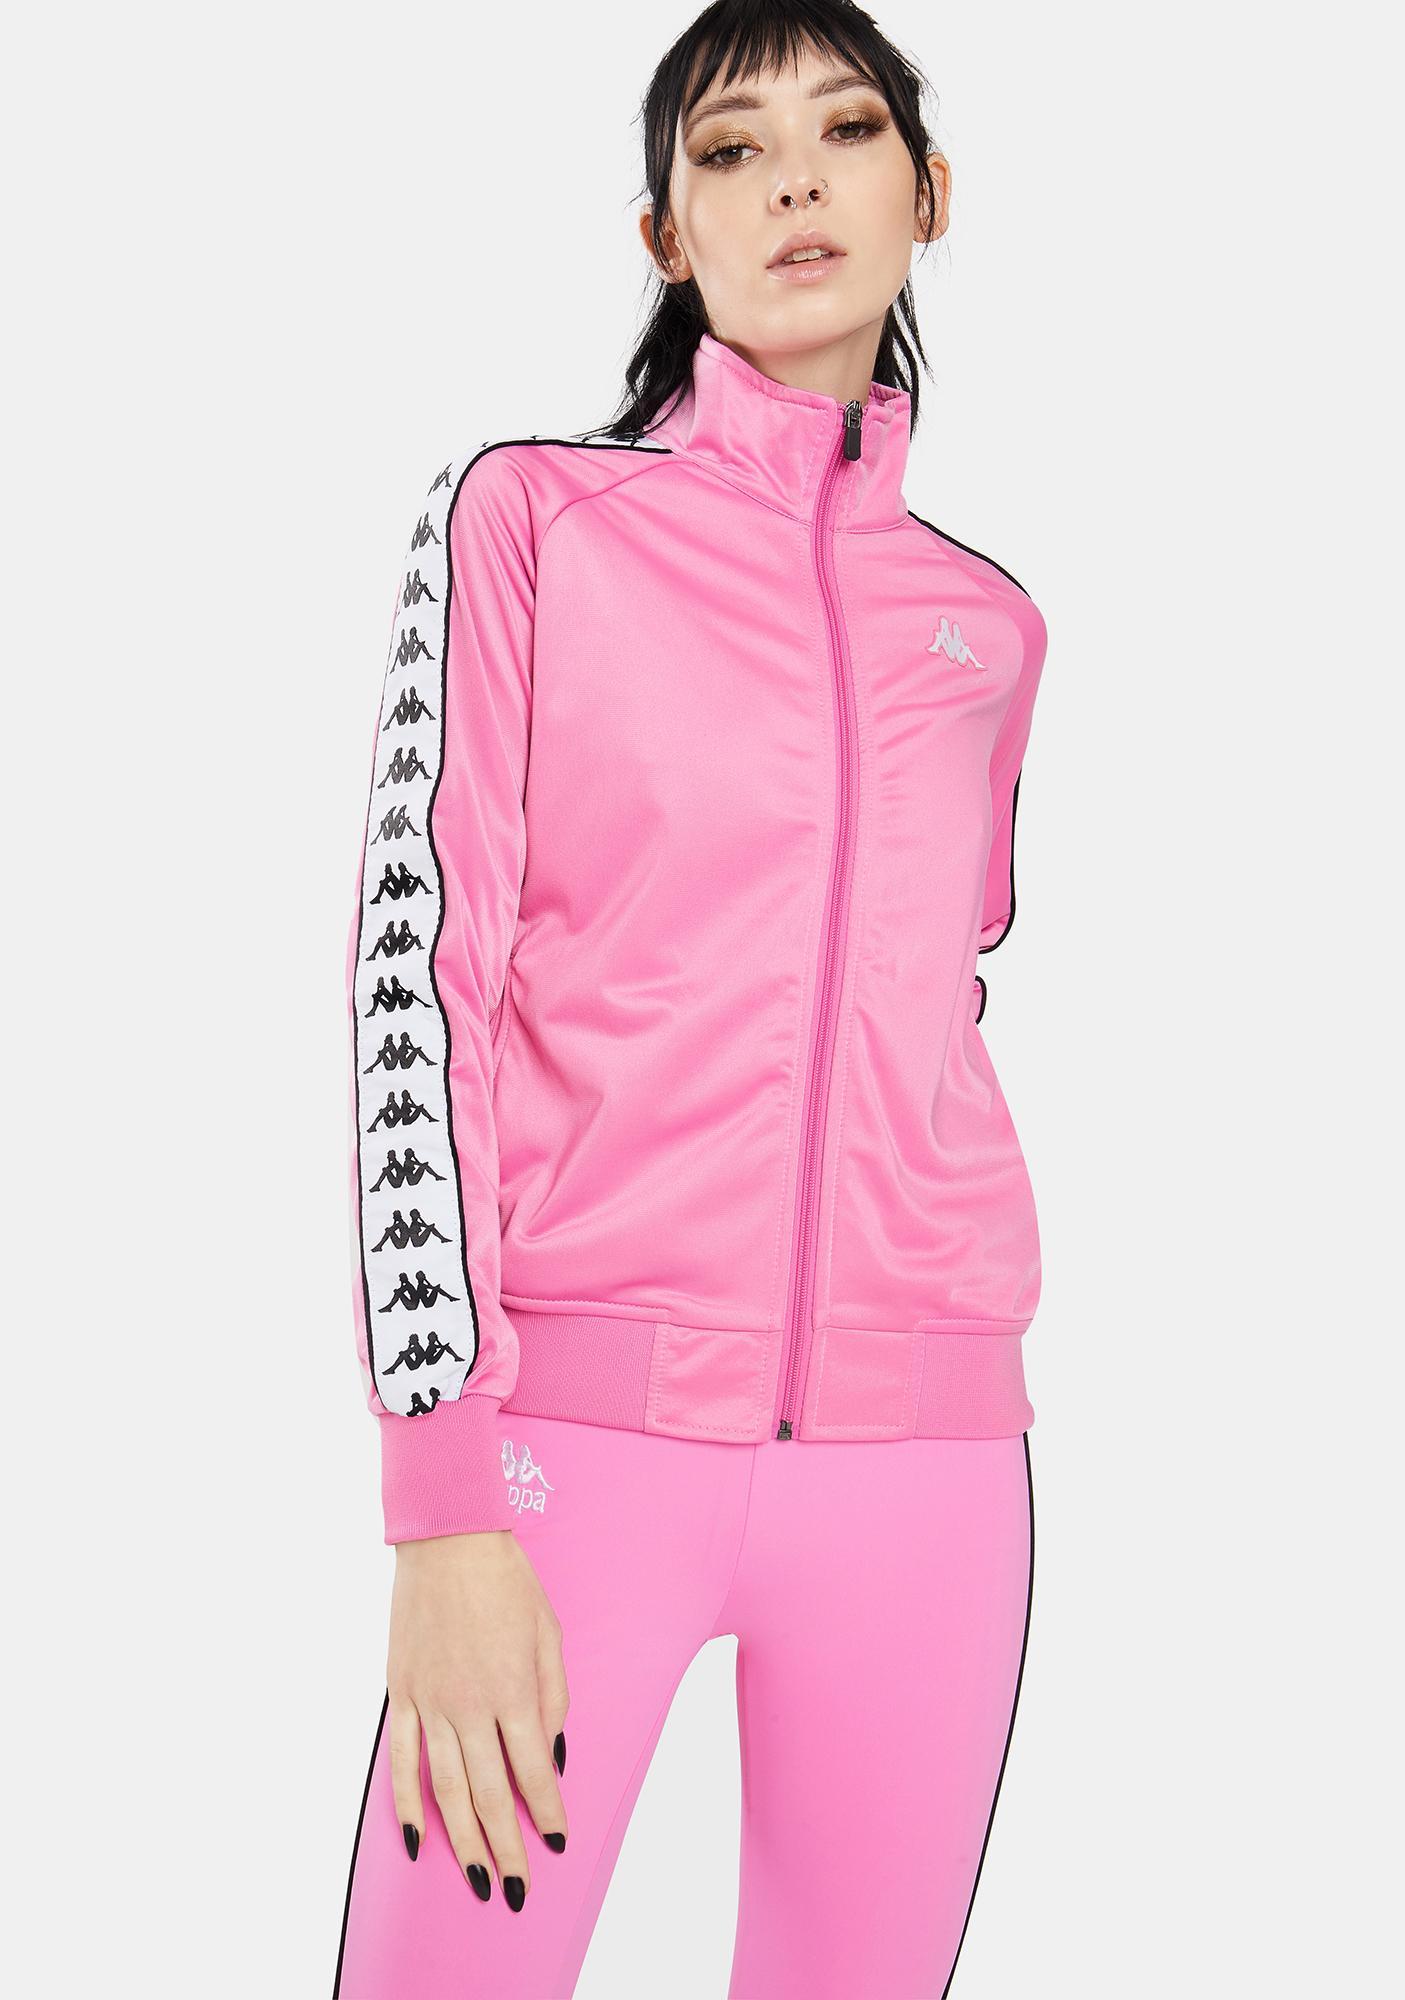 Kappa Banda Anniston 222 Fuchsia Pink White Track Jacket